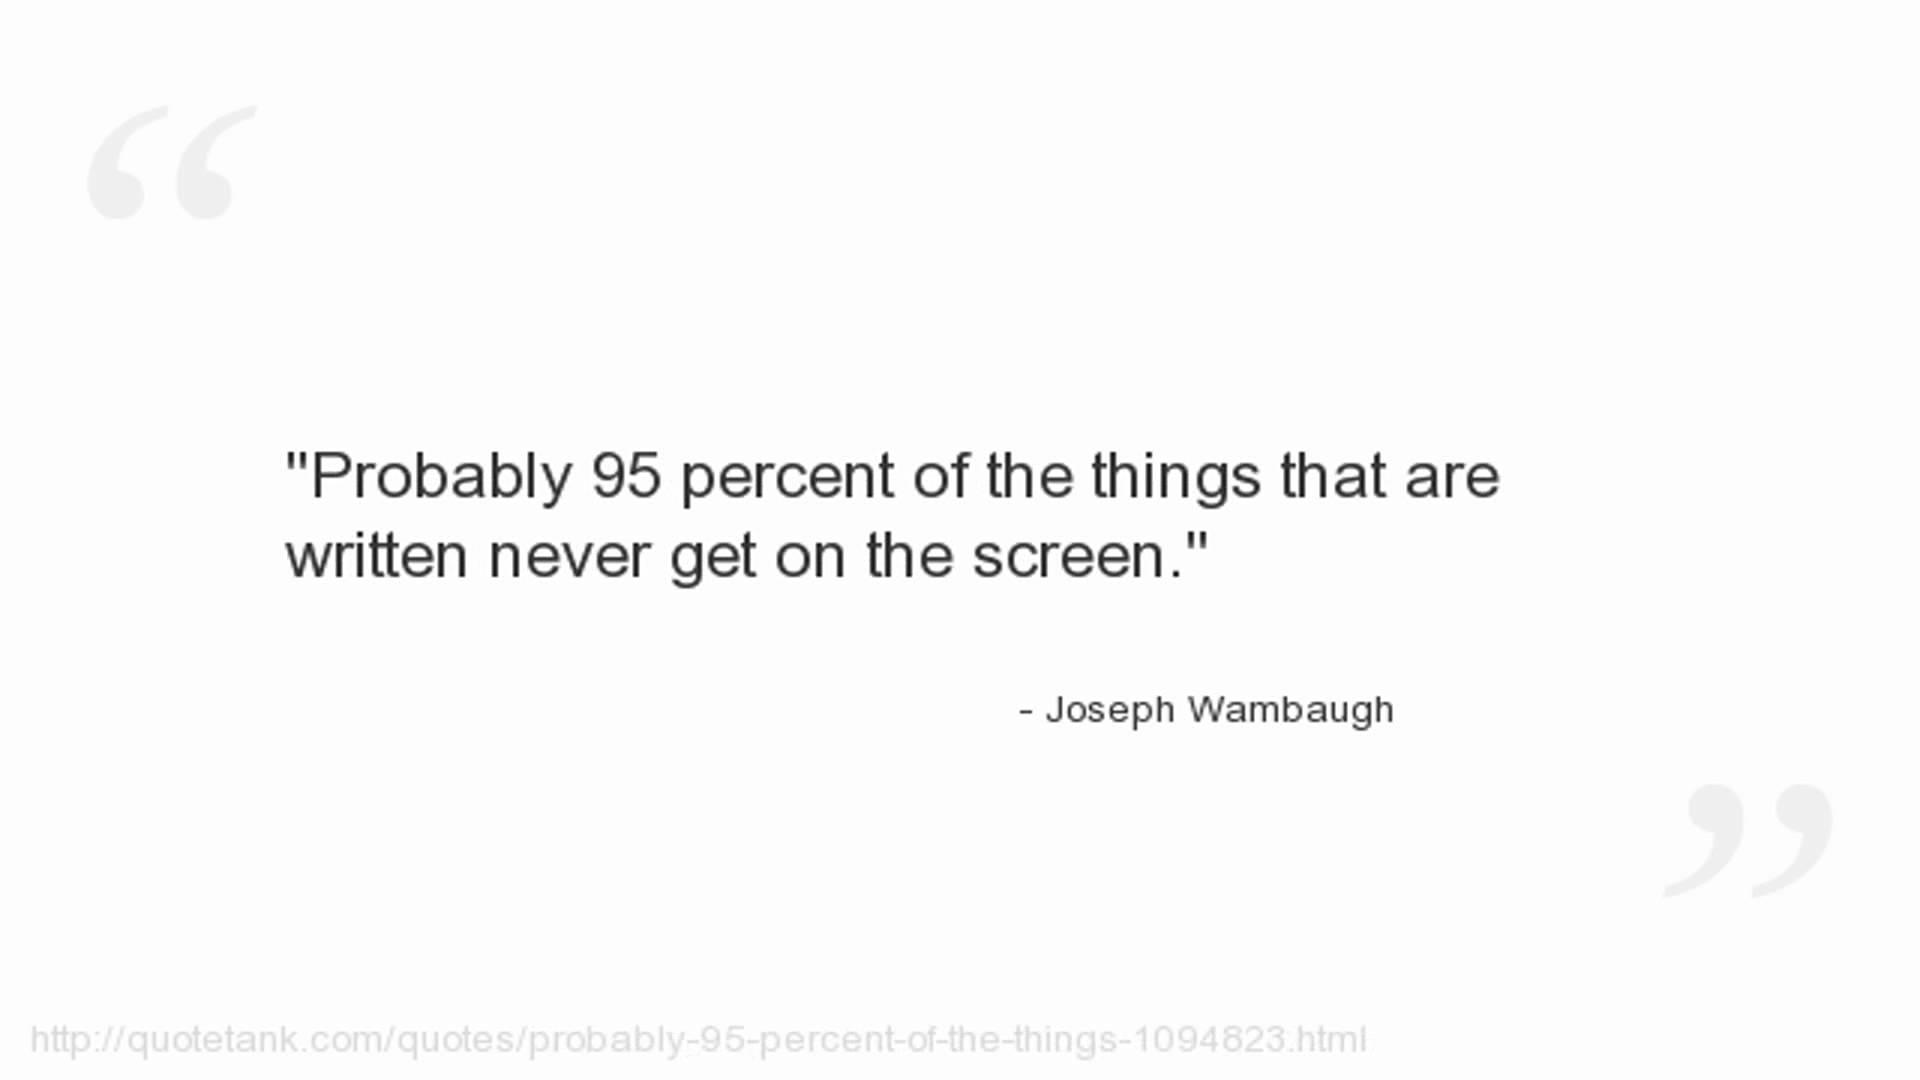 Joseph Wambaugh's quote #7